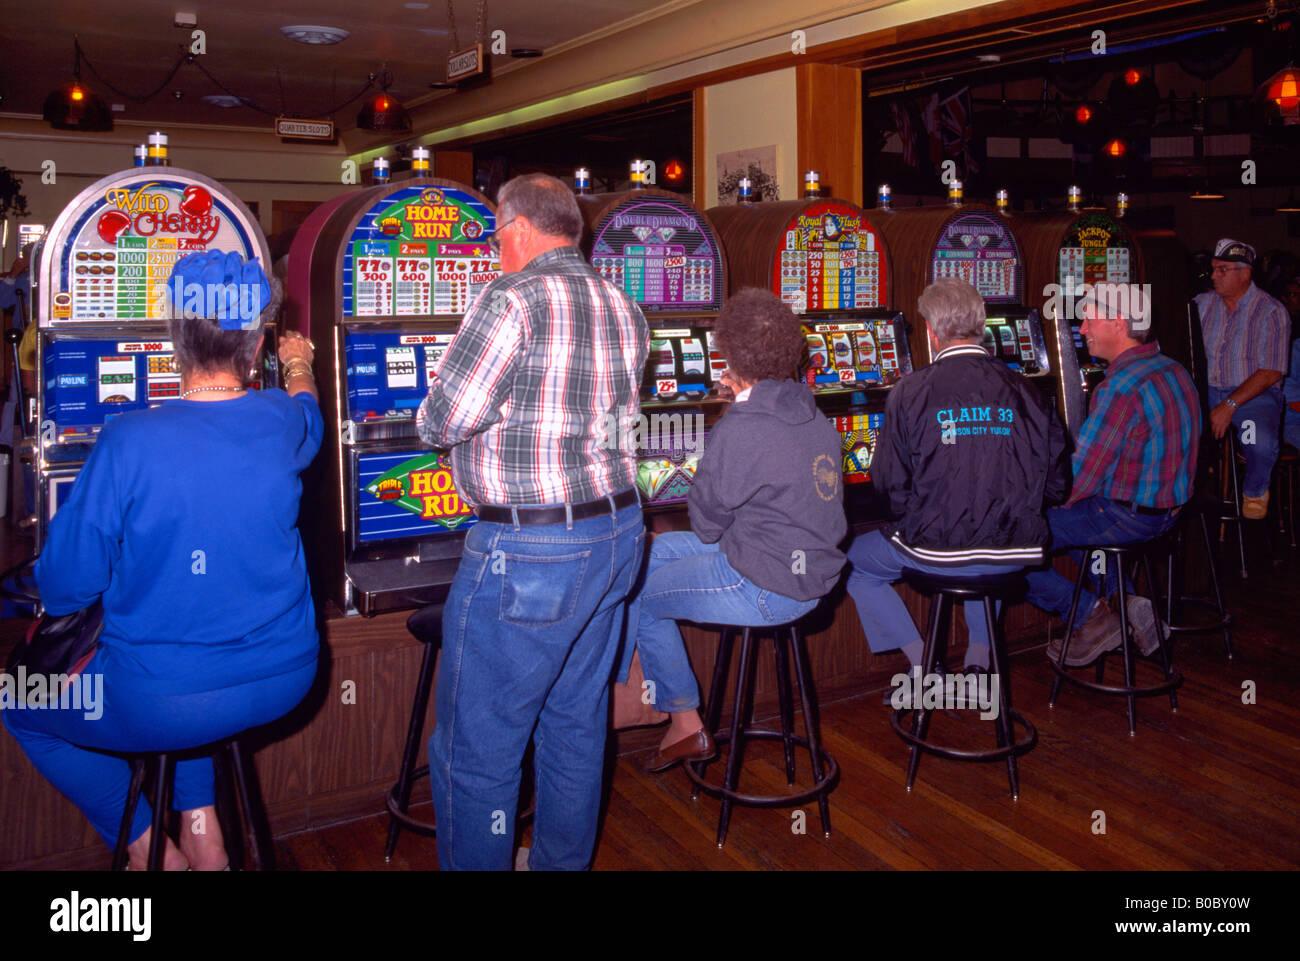 Gambling in Diamond Tooth Gertie's Gambling Hall, Dawson City, Yukon Territory, Canada - Gamblers playing Slot - Stock Image